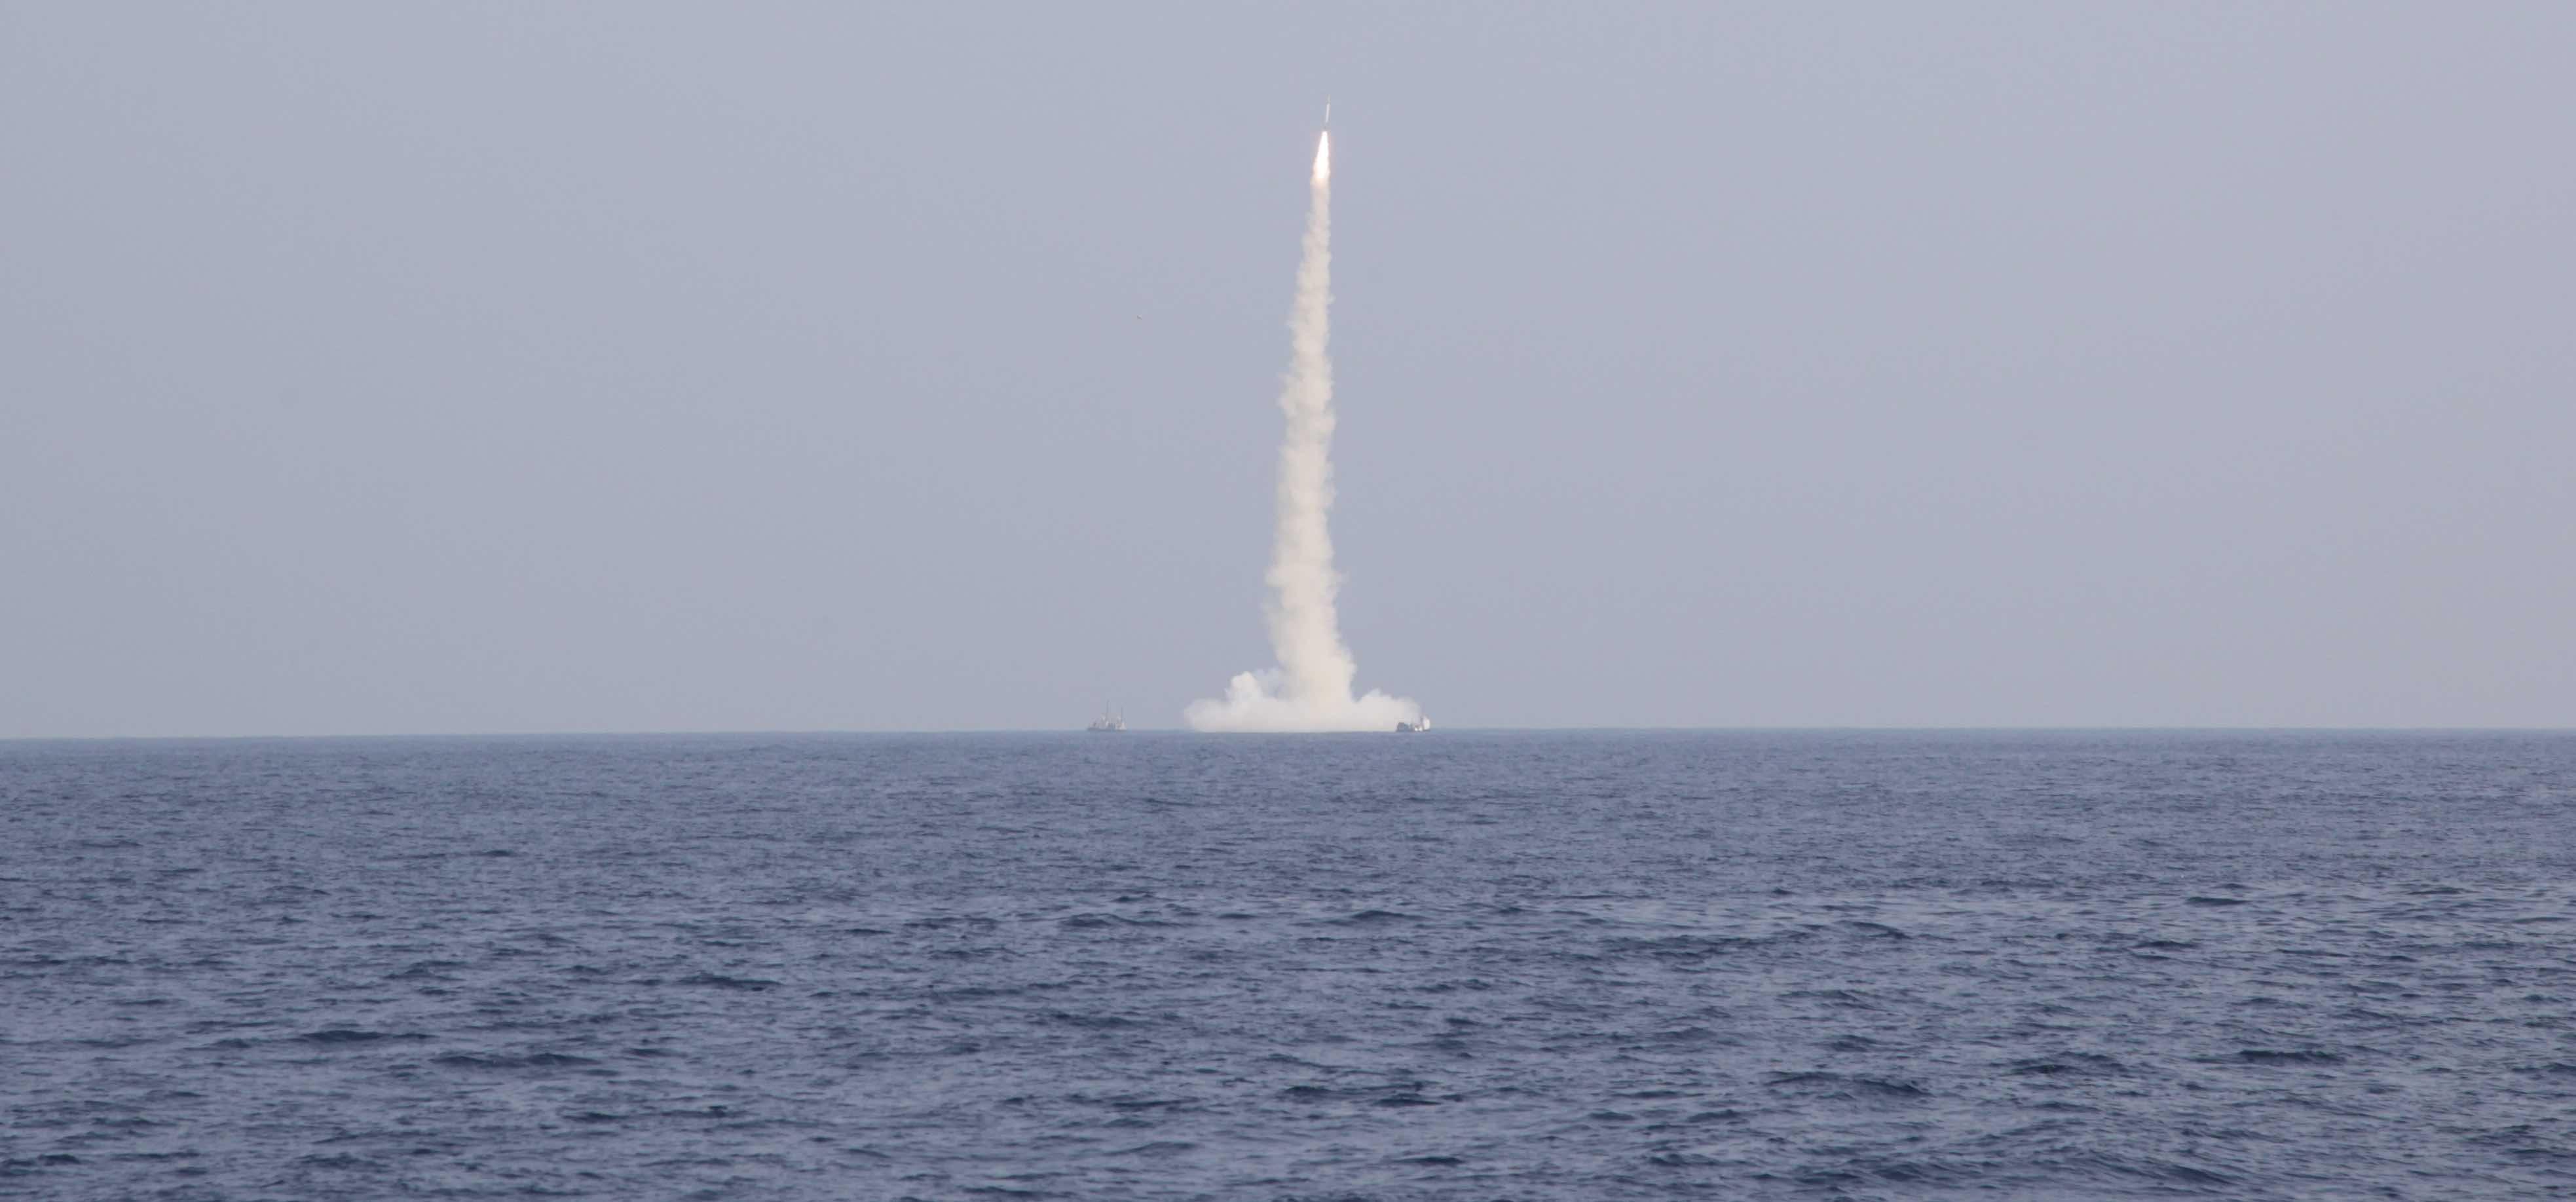 India tests a medium-range submarine-launched ballistic missile (Photo: Pallava Bagla/Getty)